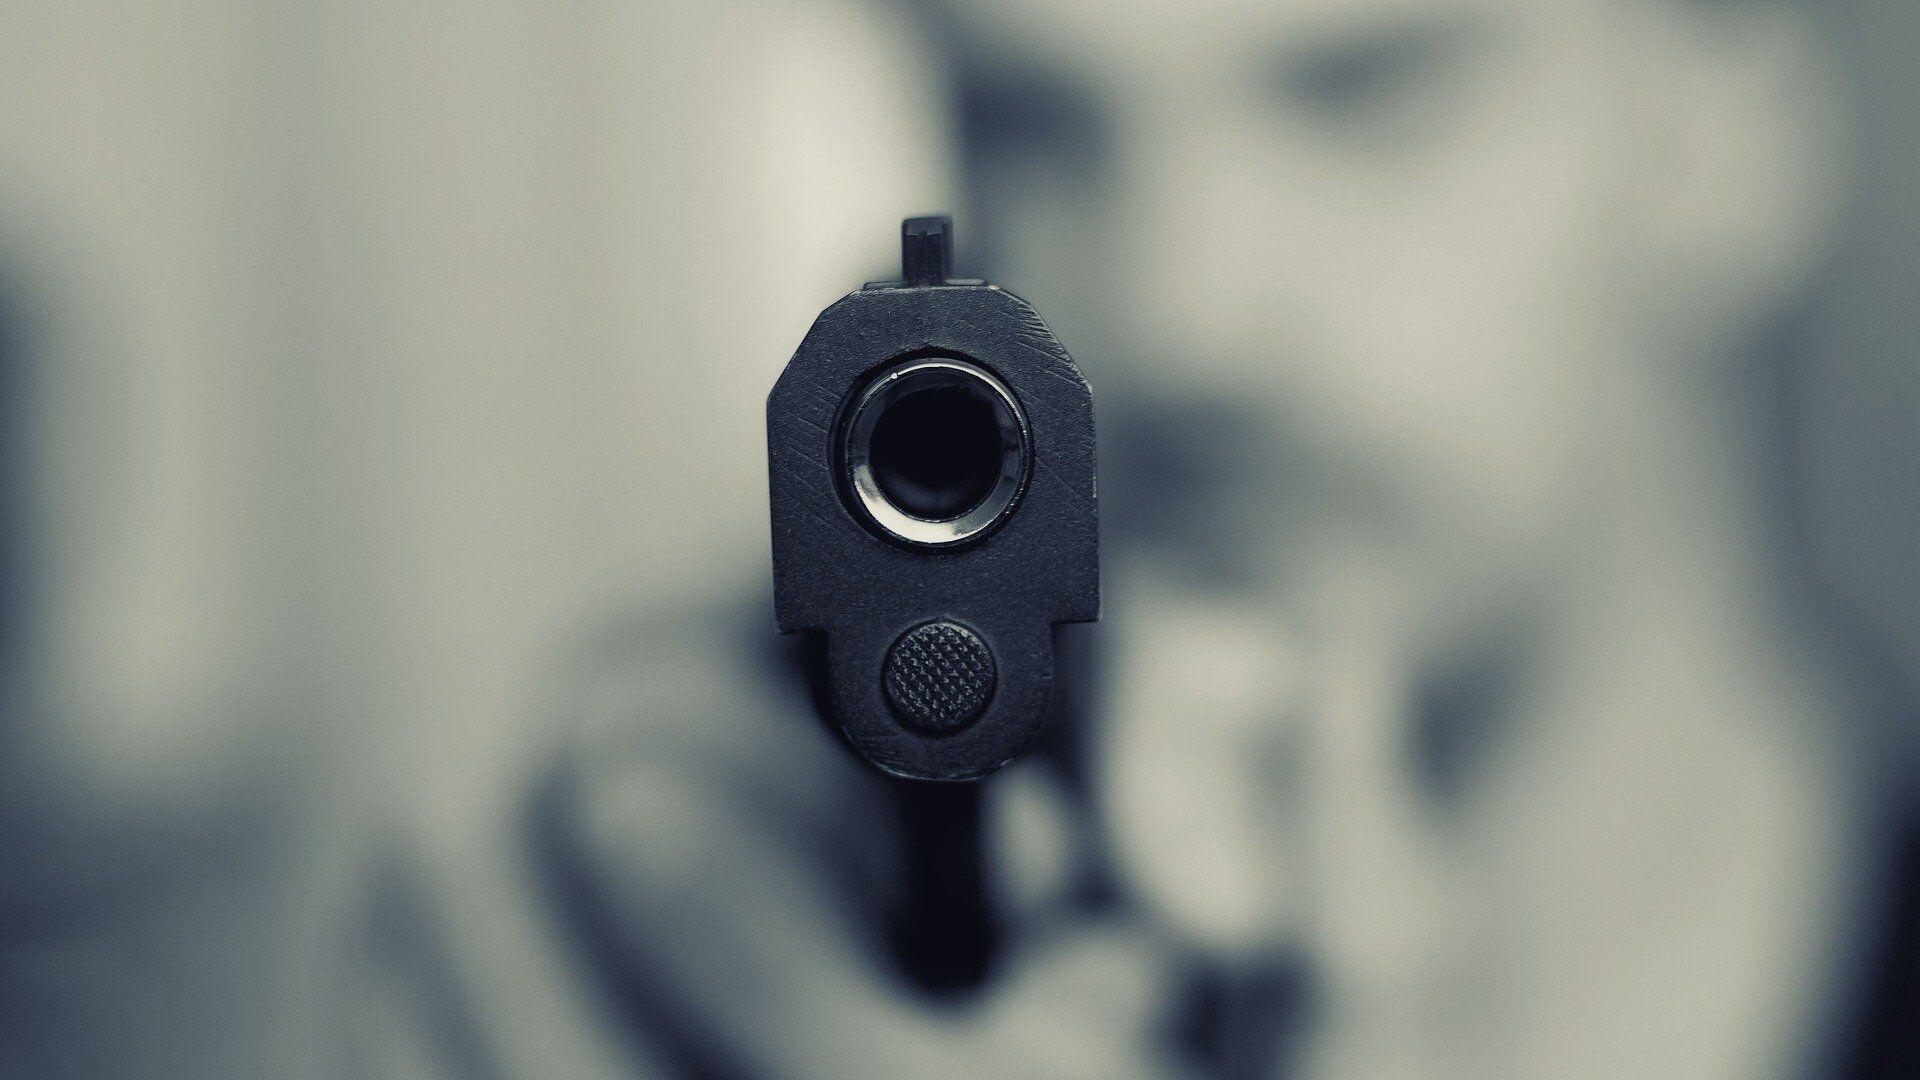 Una pistola (imagen referencial) - Sputnik Mundo, 1920, 14.05.2021